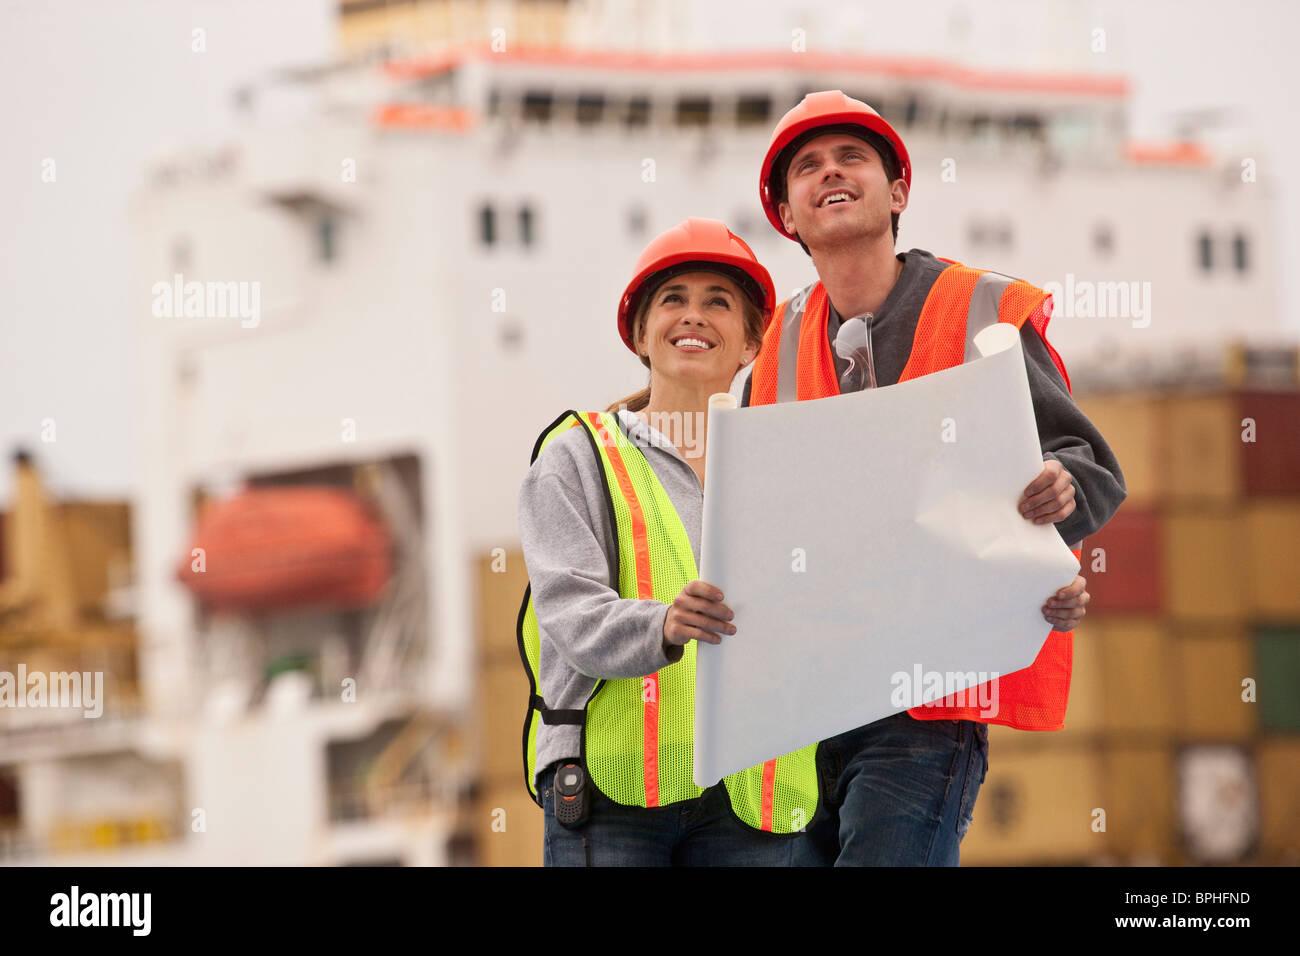 Les ingénieurs des transports holding a blueprint and smiling Photo Stock